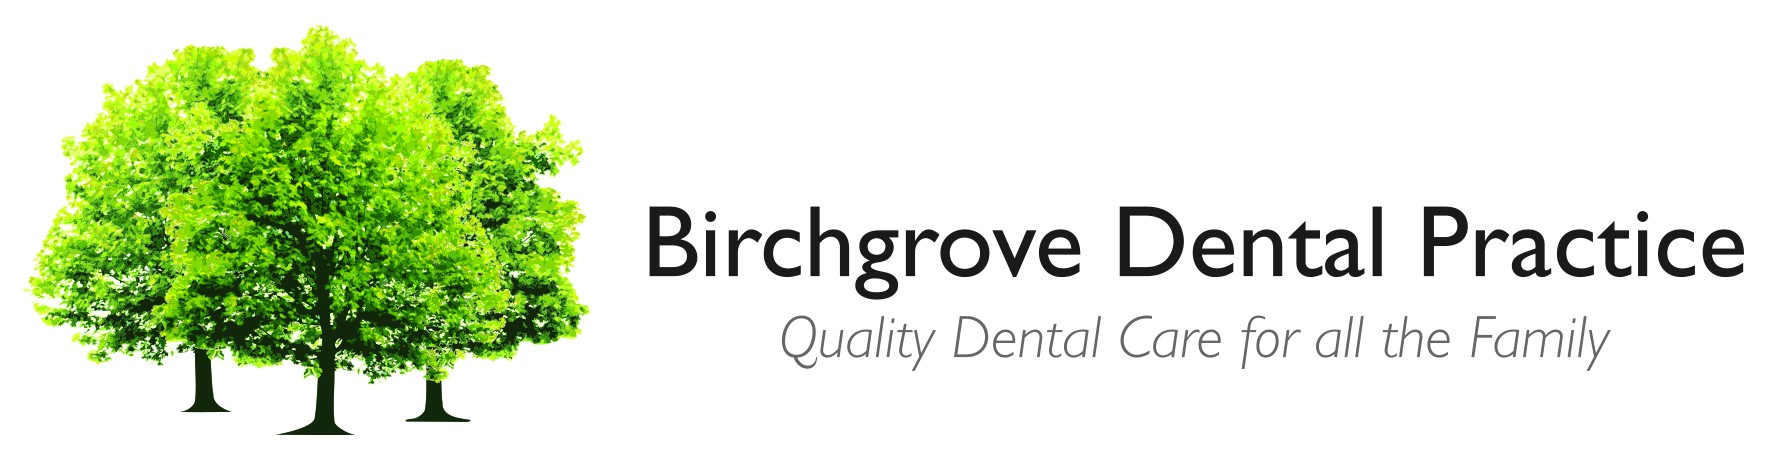 Birchgrove Dental Practice